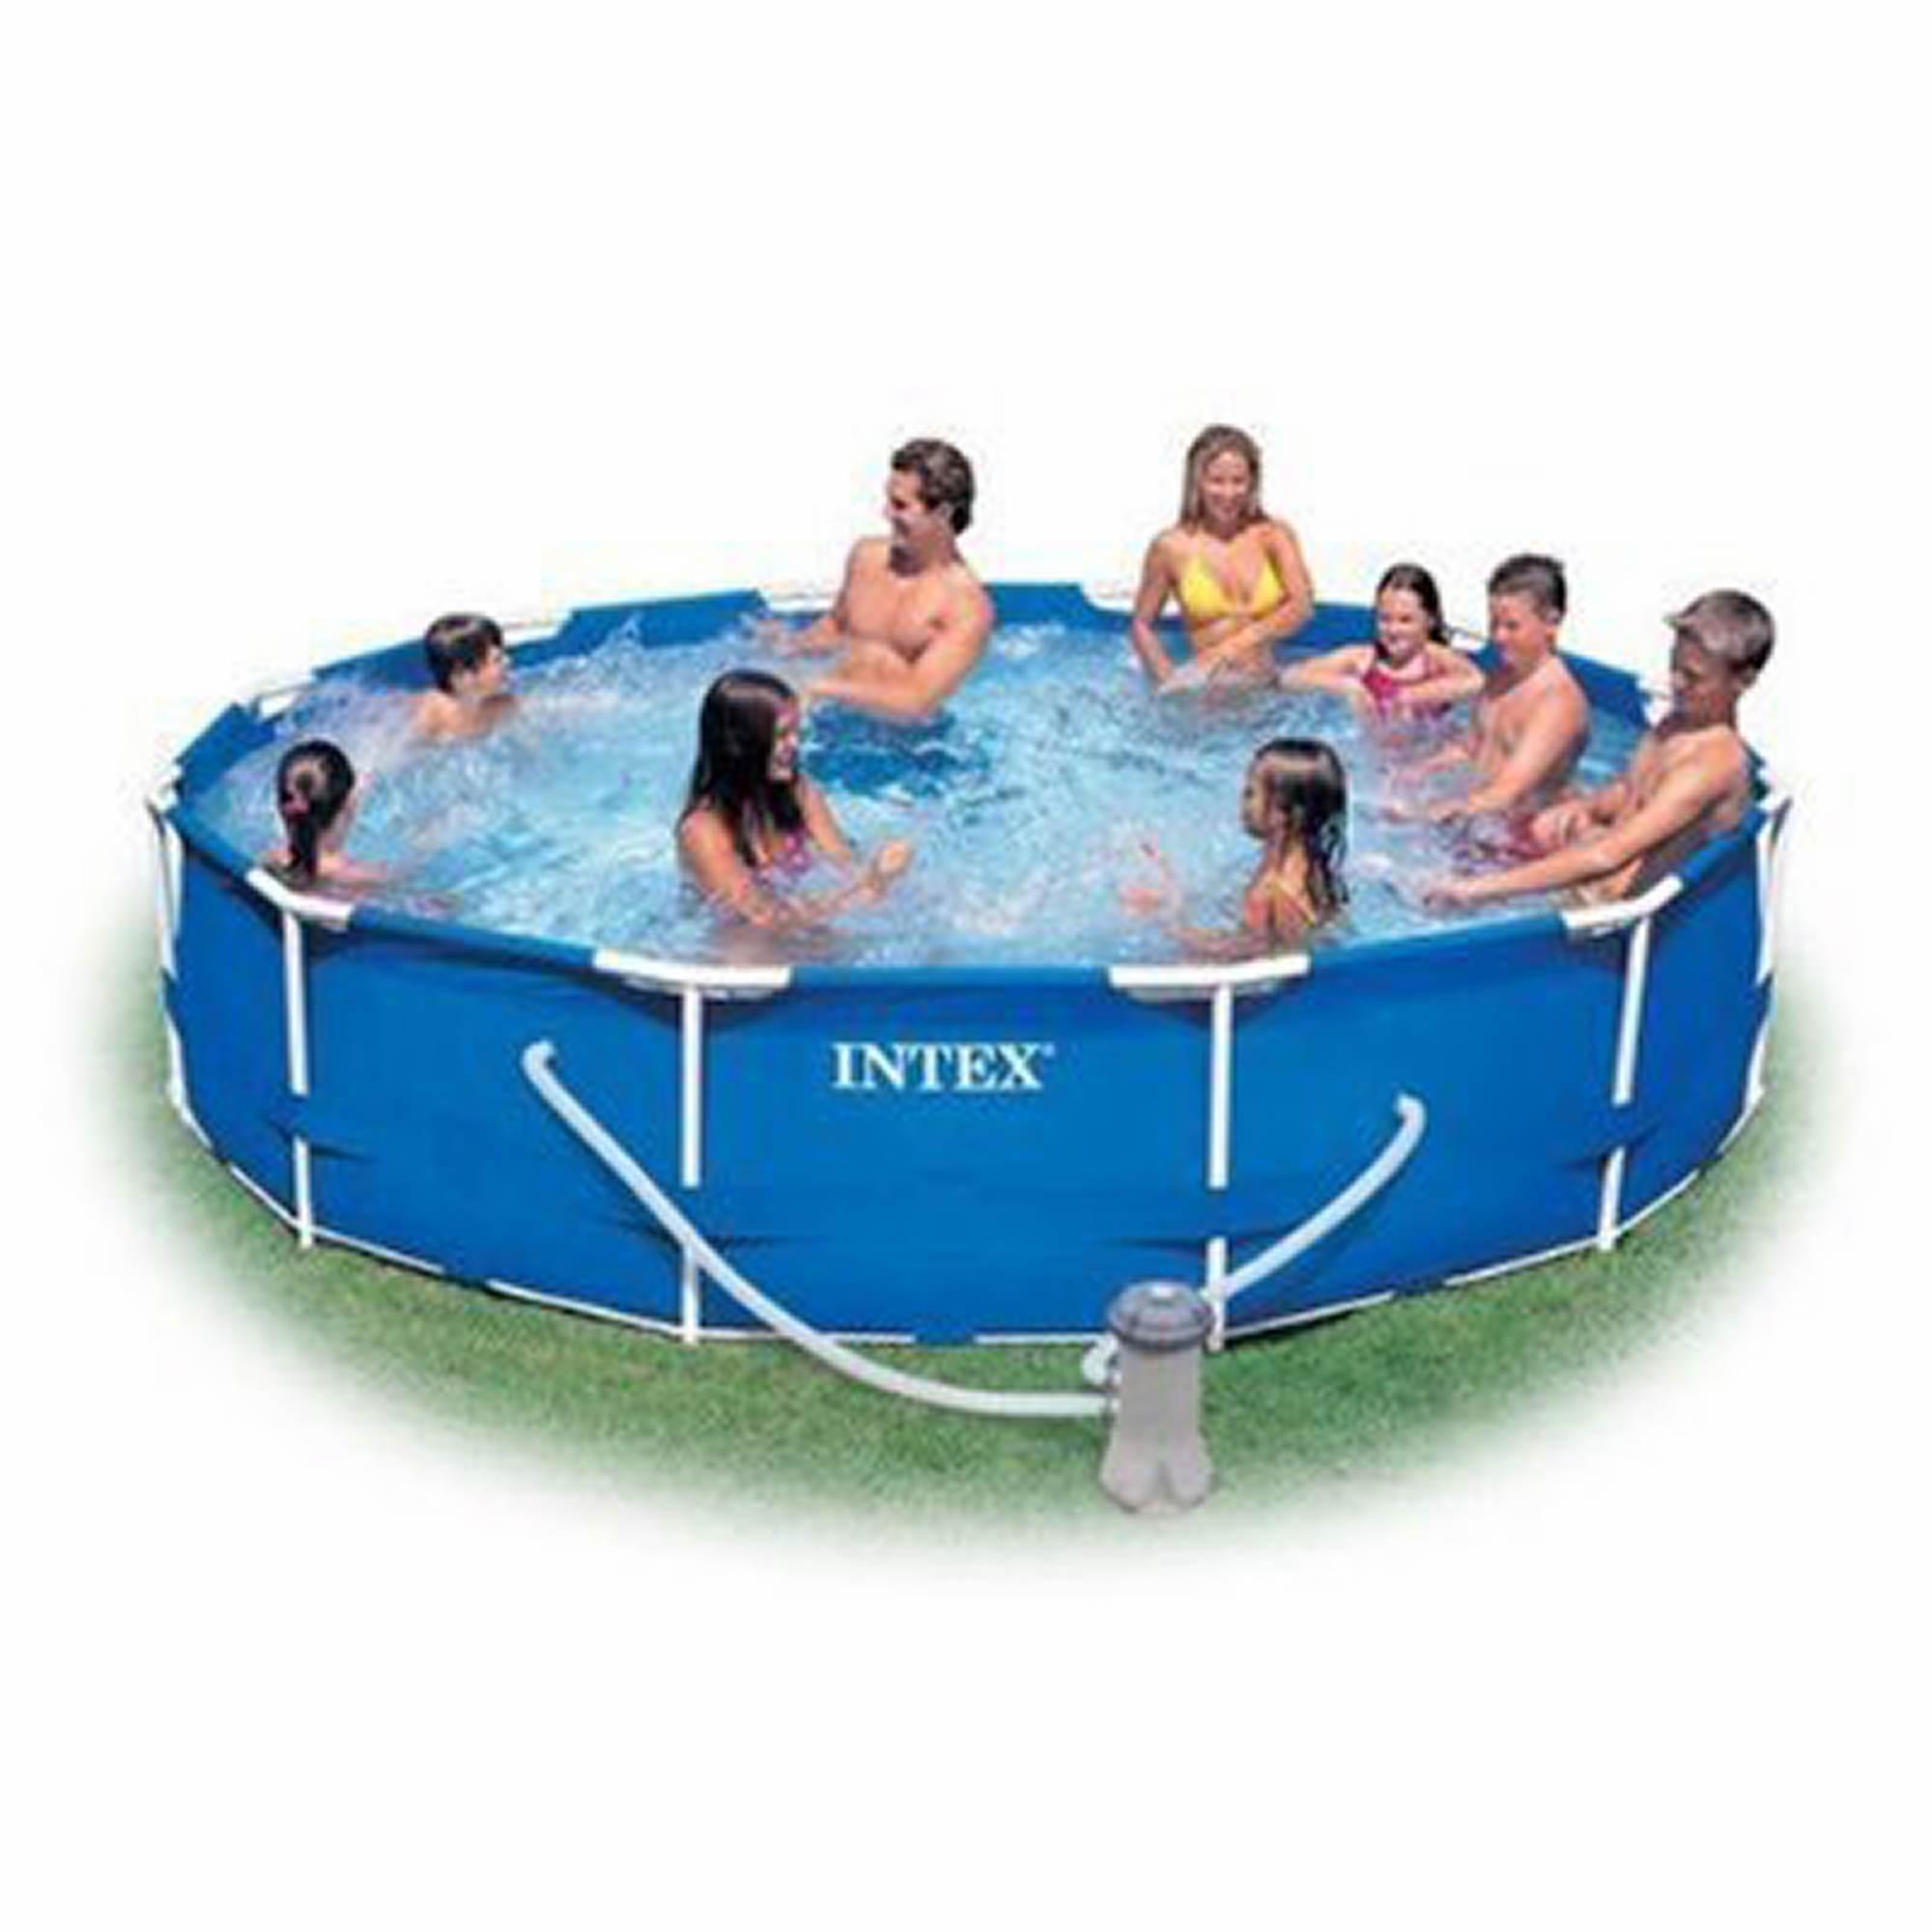 intex 12 39 x 30 round aboveground metal frame pool bj 39 s wholesale club. Black Bedroom Furniture Sets. Home Design Ideas